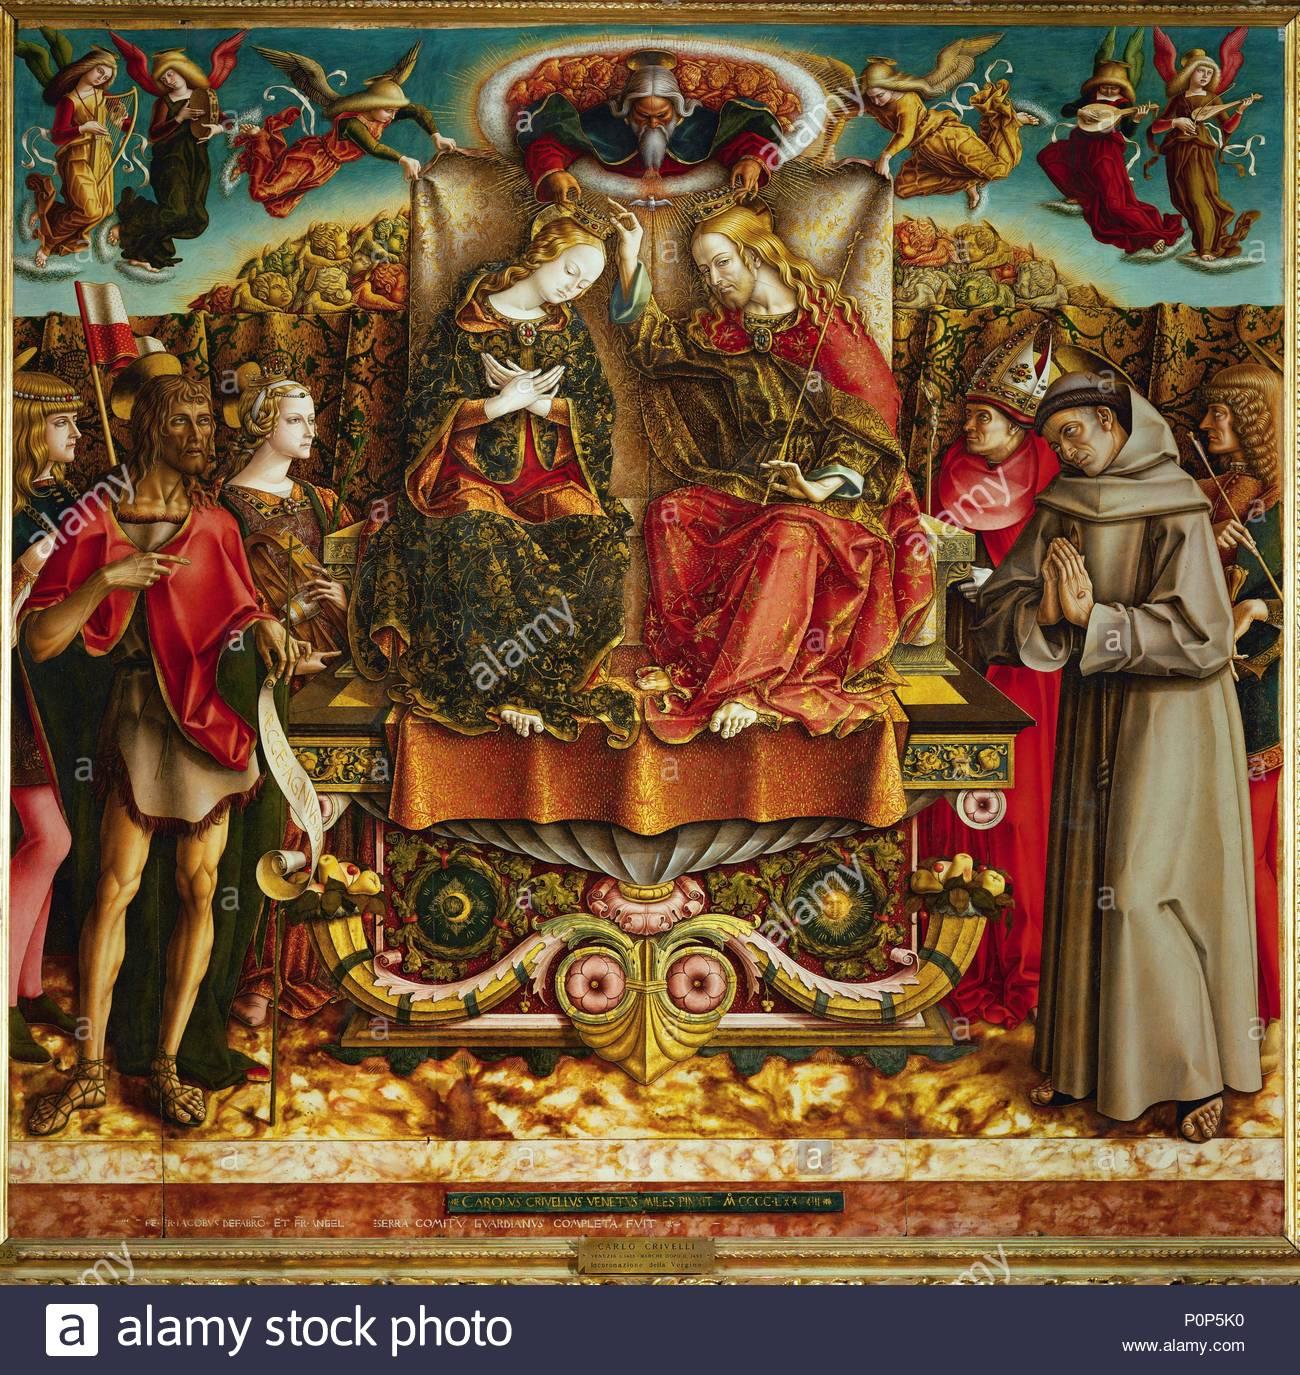 125 128 Stock Photos Images Alamy Brera I Love Birdy Graphic Designed Hand Bag Black Coronation Of The Virgin With Saints John Baptist Mary Magdalen Left